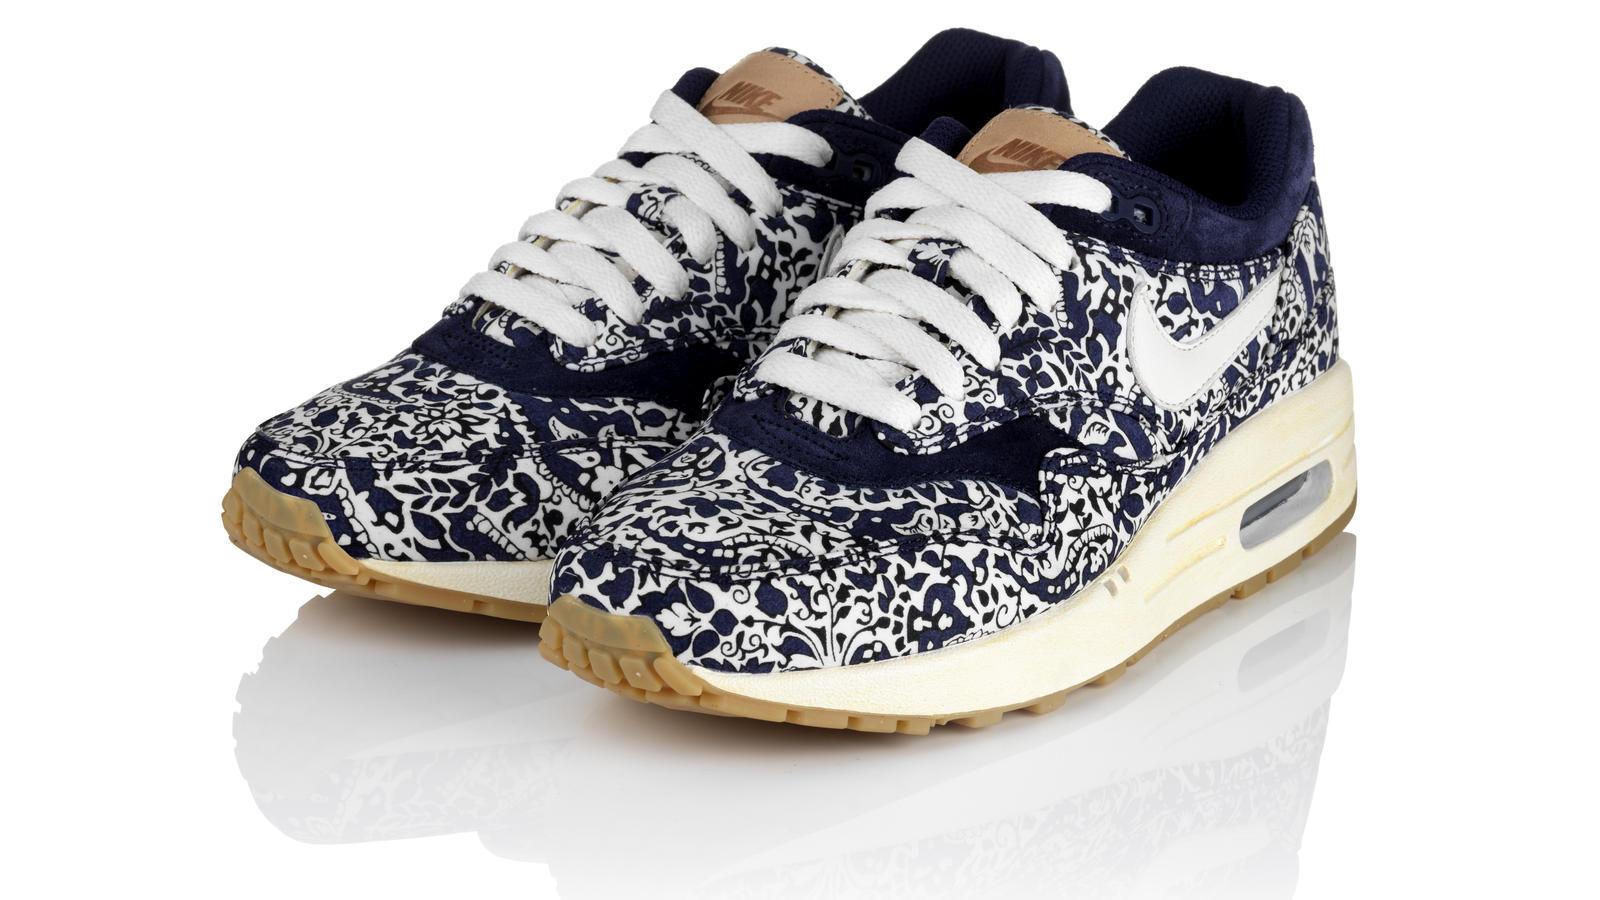 Nike Sportswear x Liberty Collection